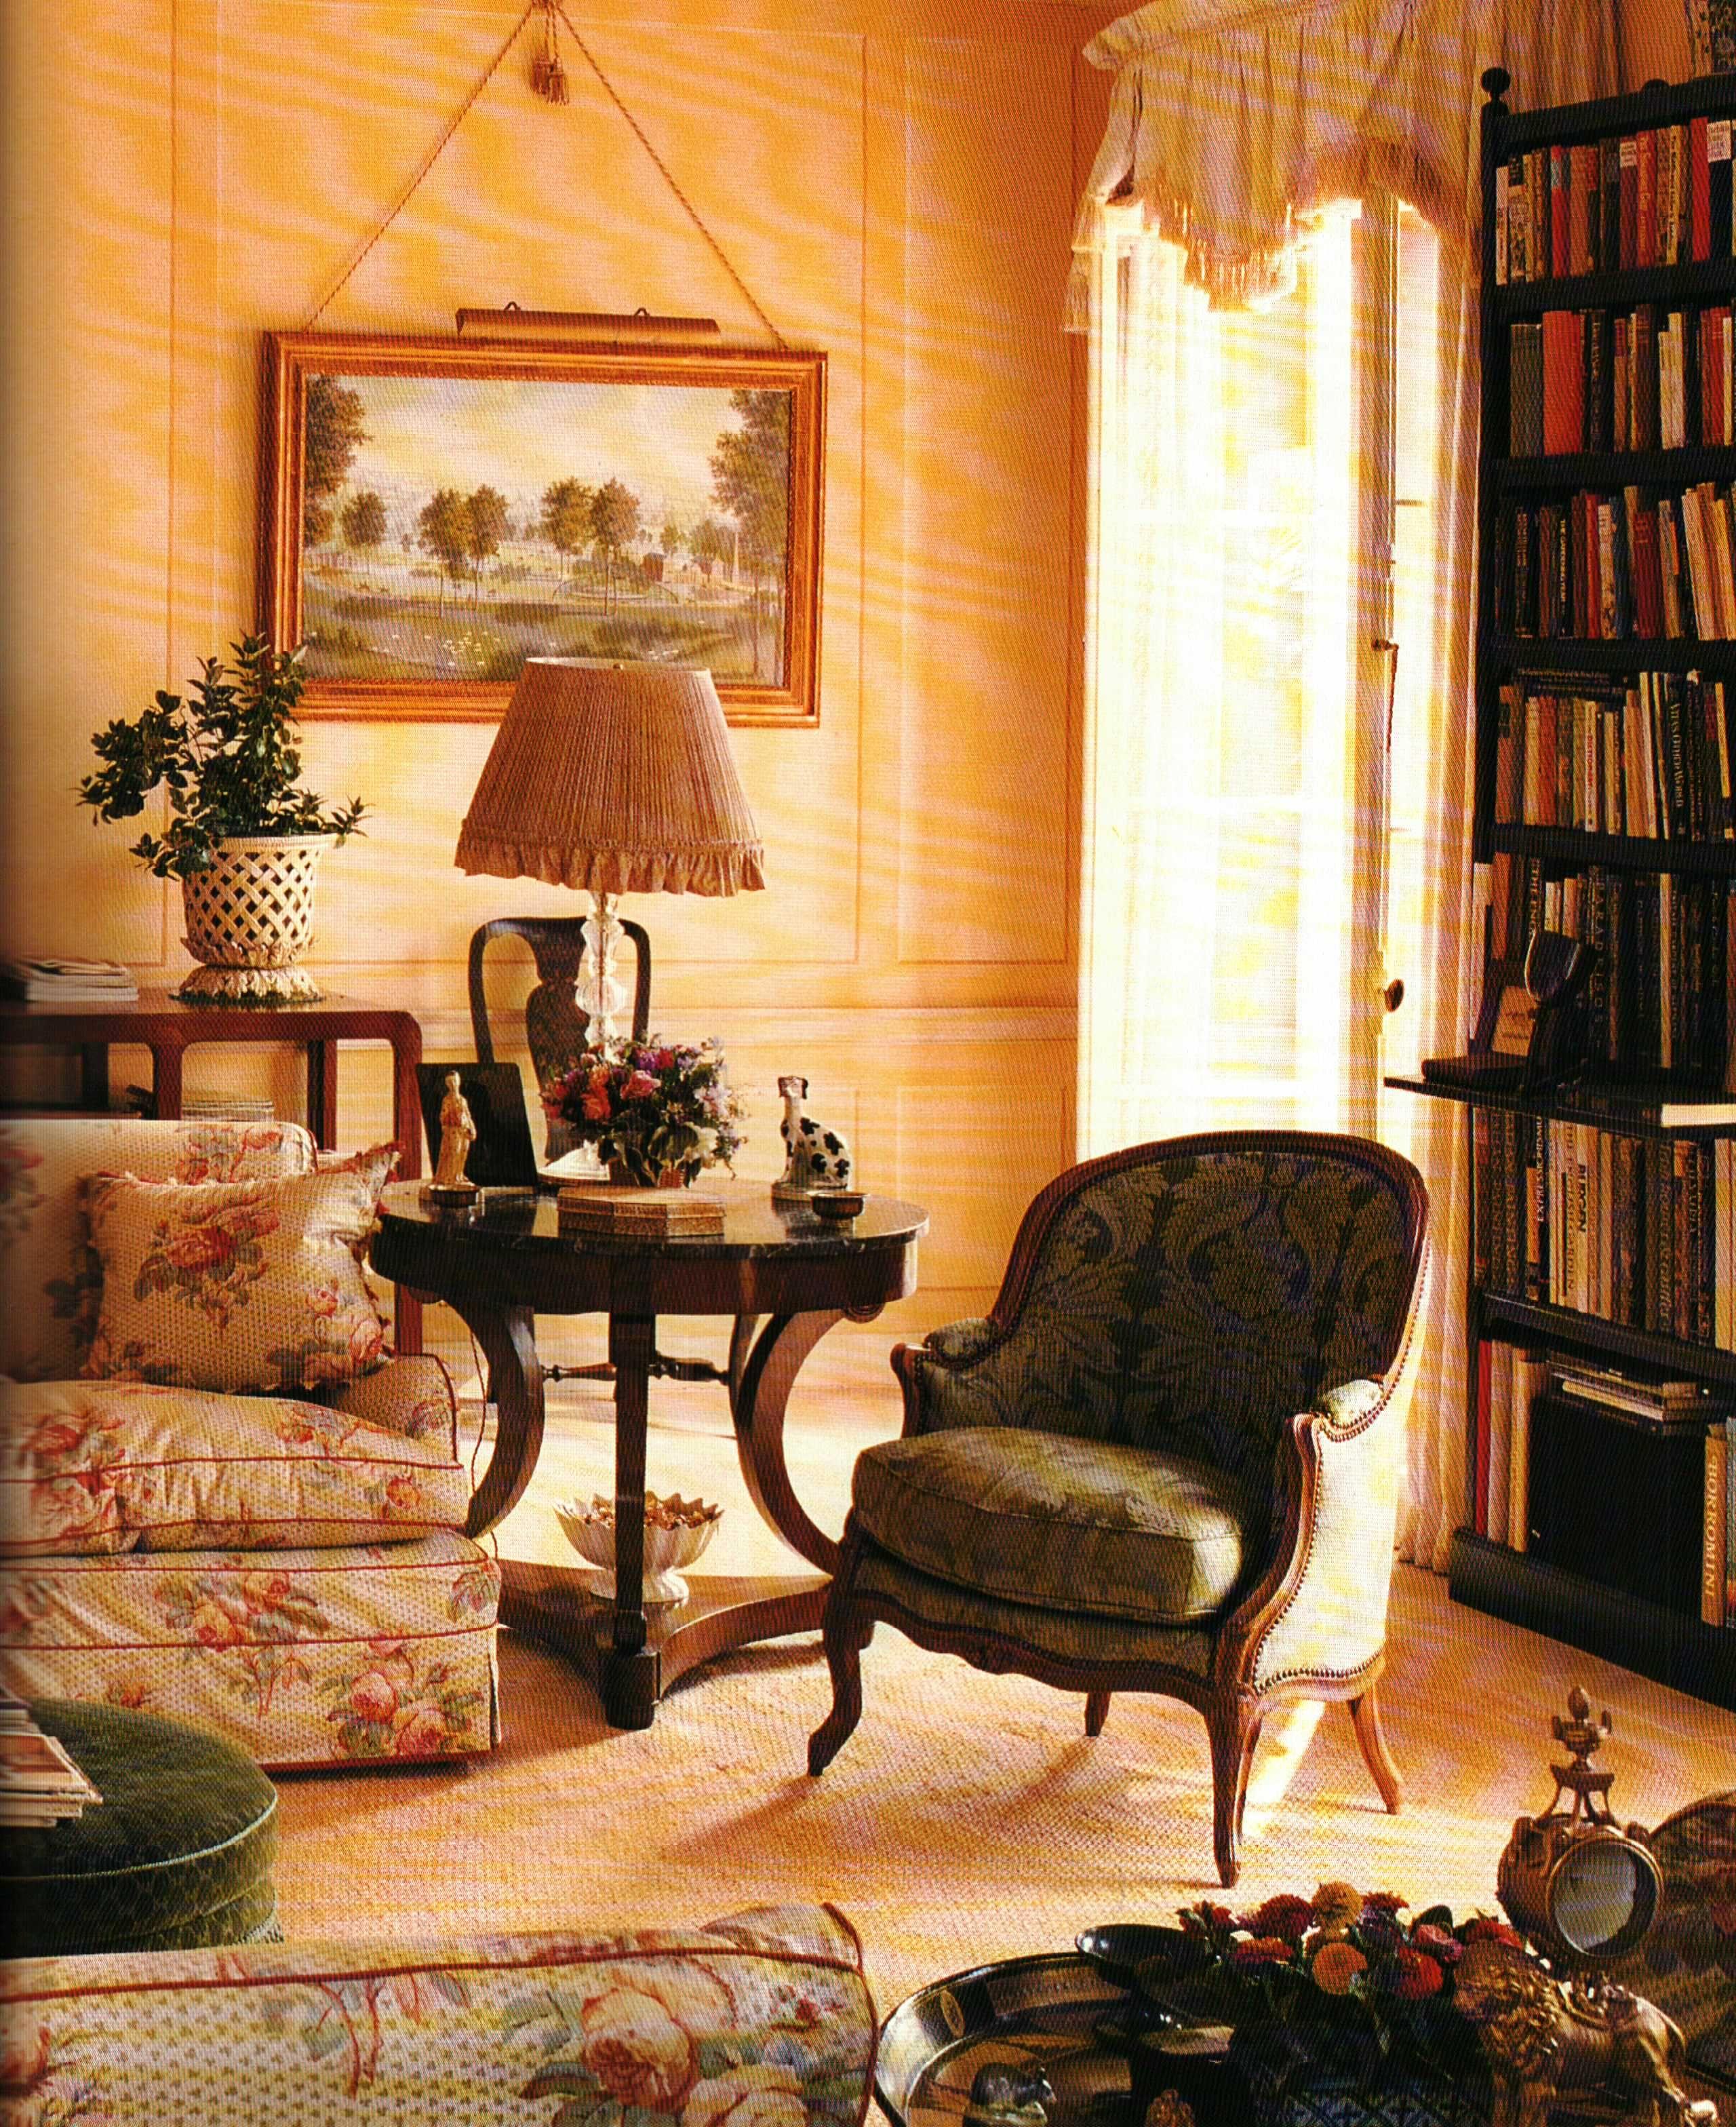 English Country sitting room with chintz sofa | Decoracion ...